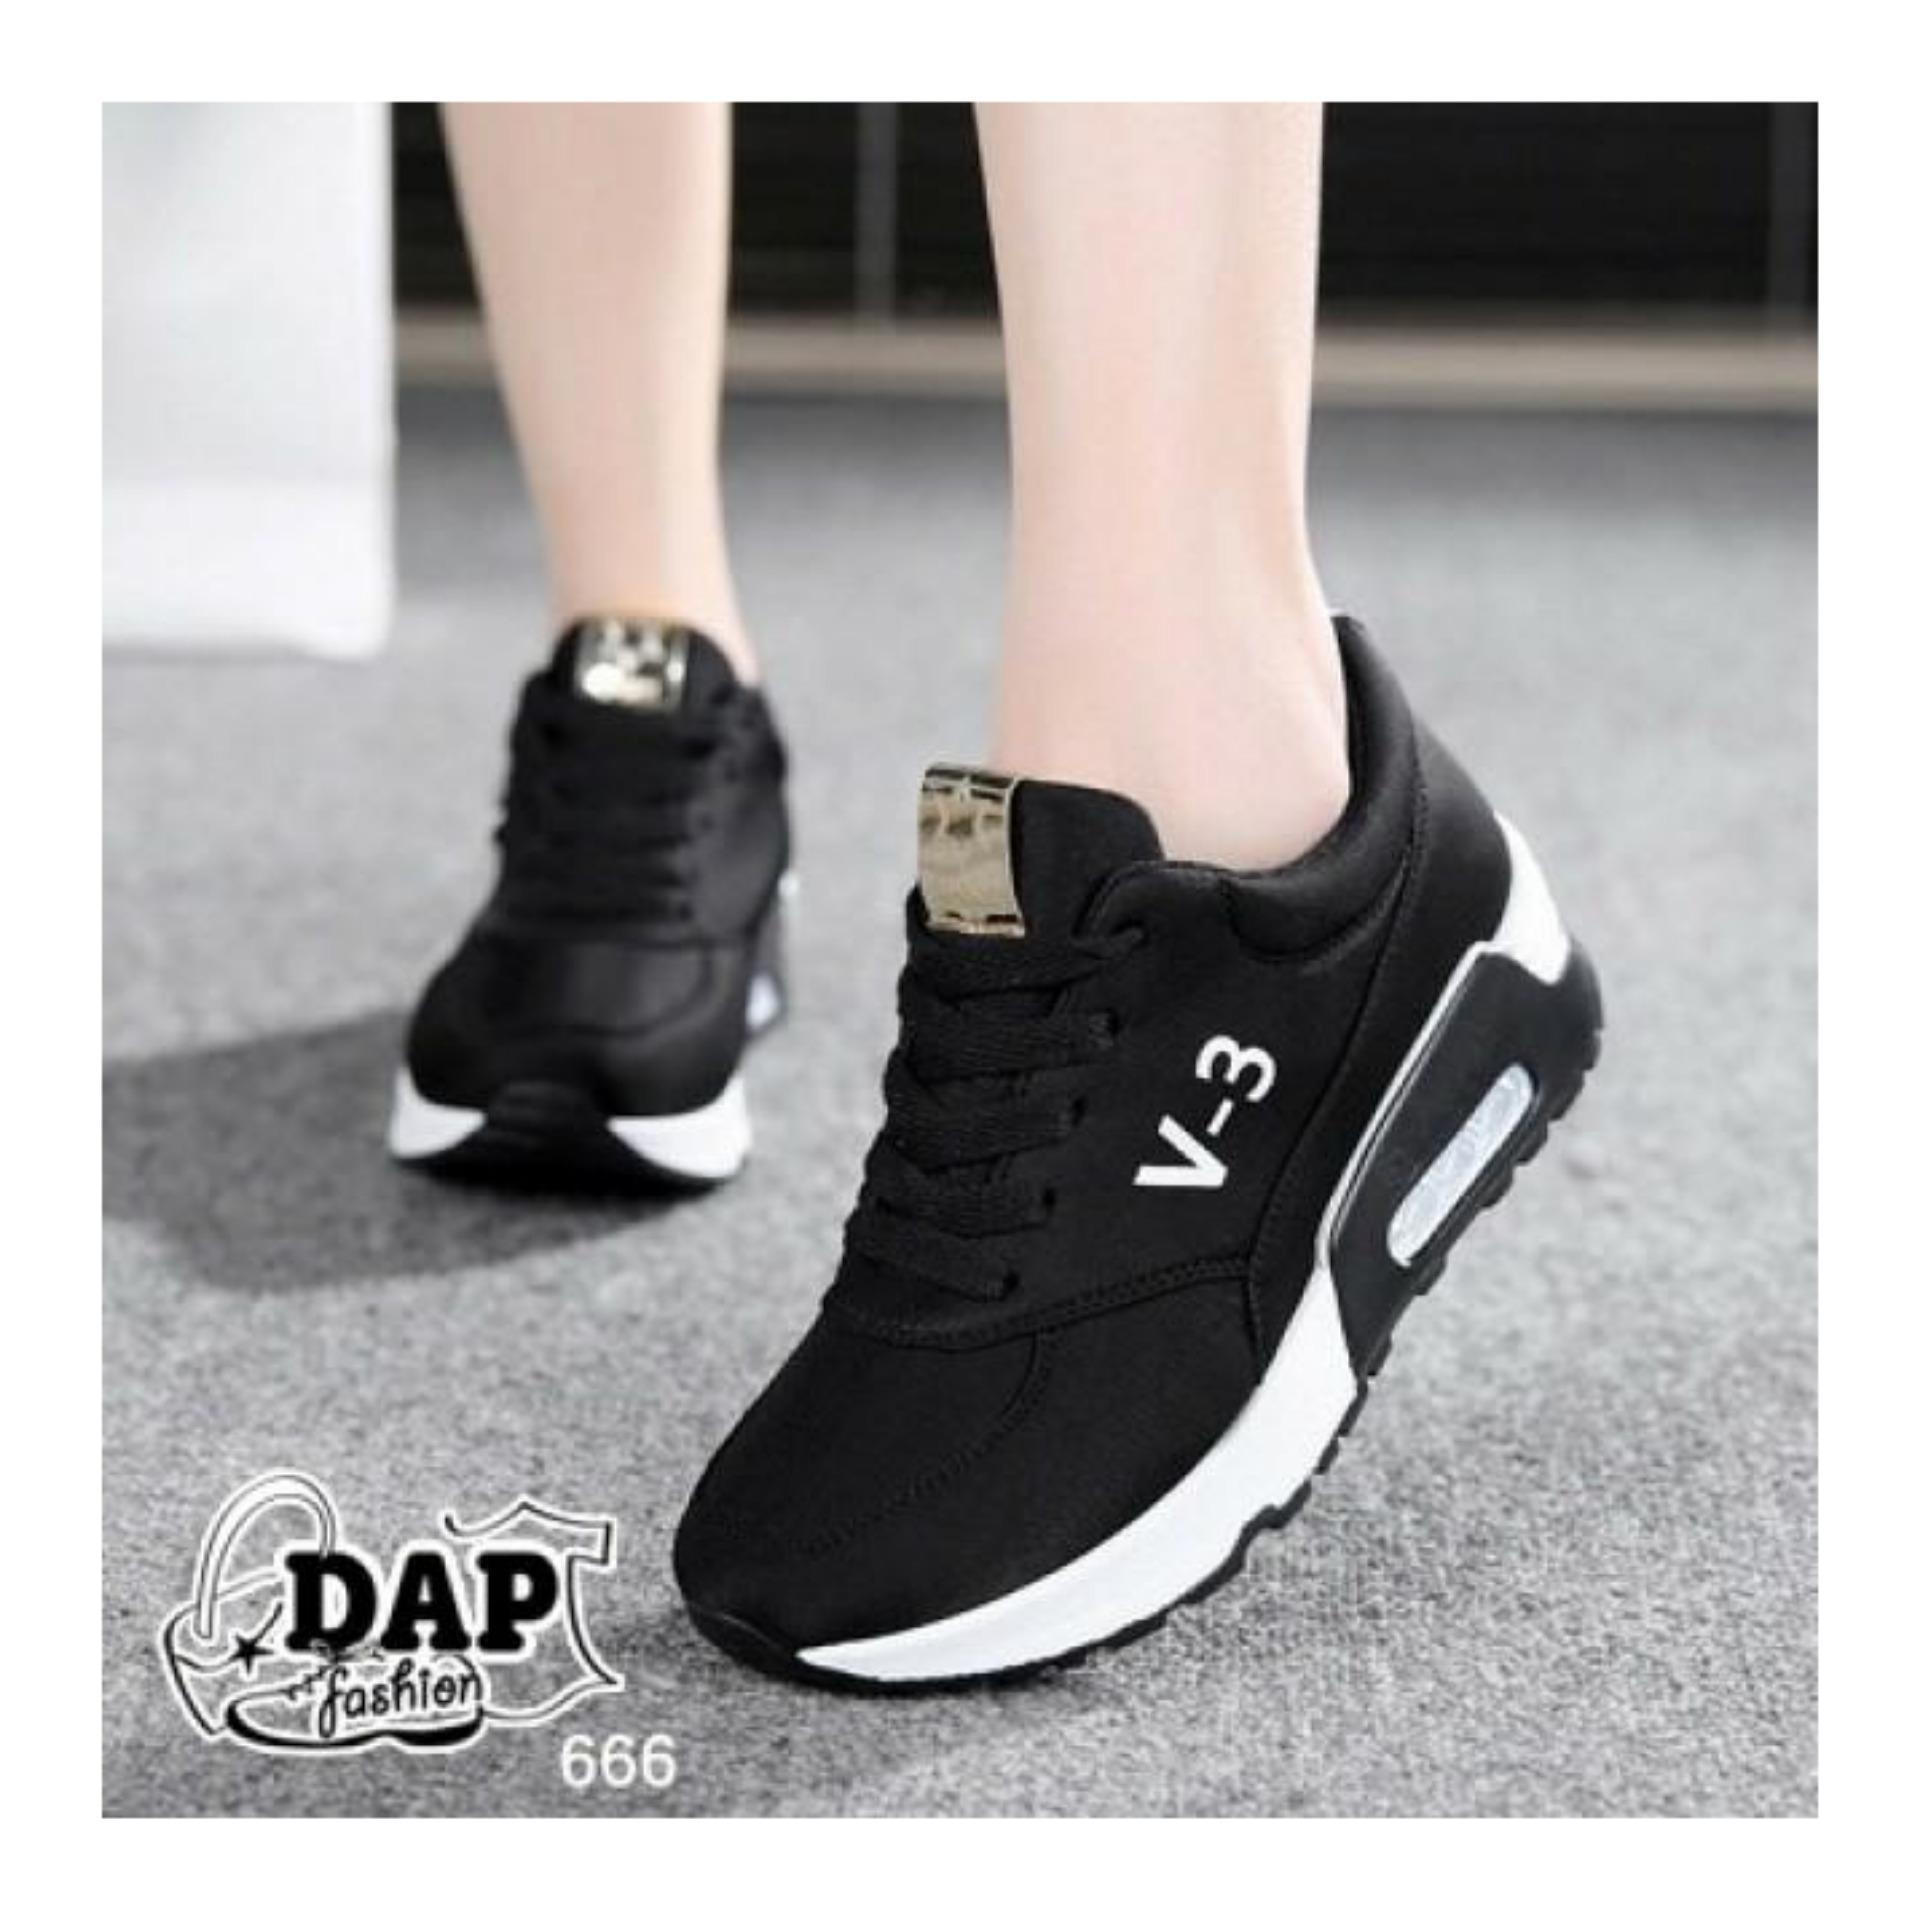 Wanita Fashion Sneakers Lace Sepatu Casual Kaki Manis Dea Anak 1704 161 Black Size 31 36 V 3 Sport Running